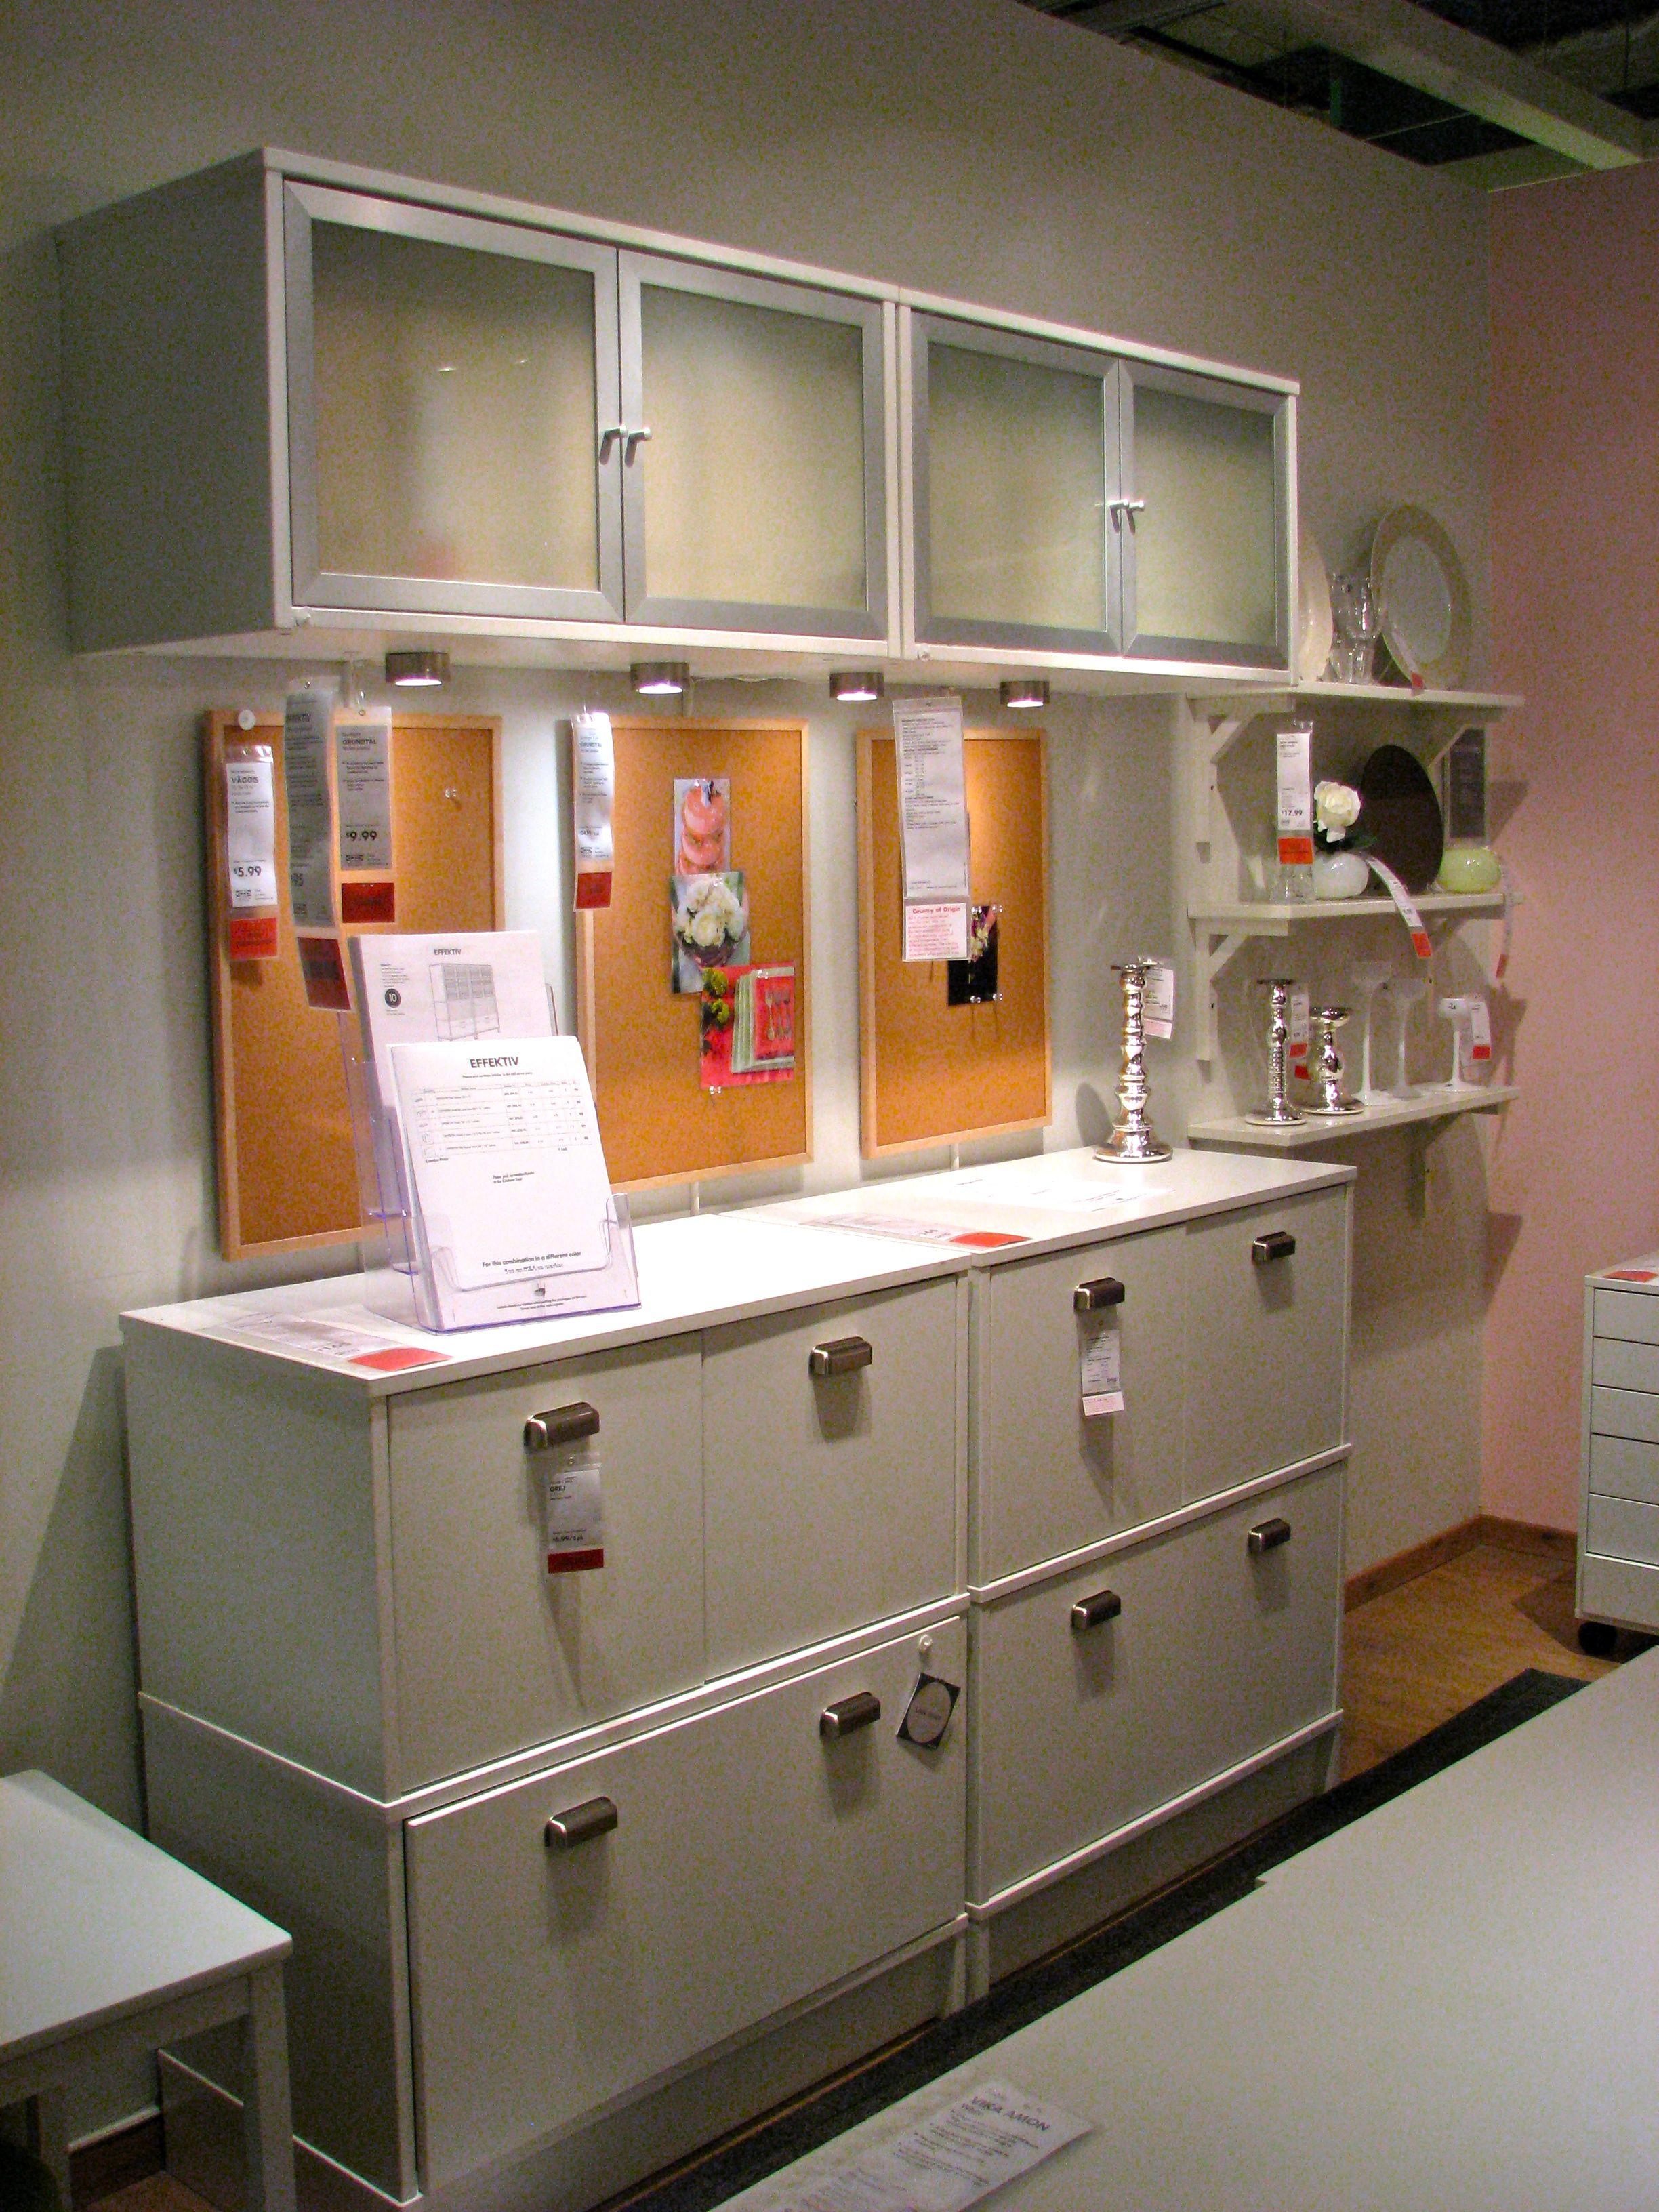 44+ Ikea canada craft room ideas information